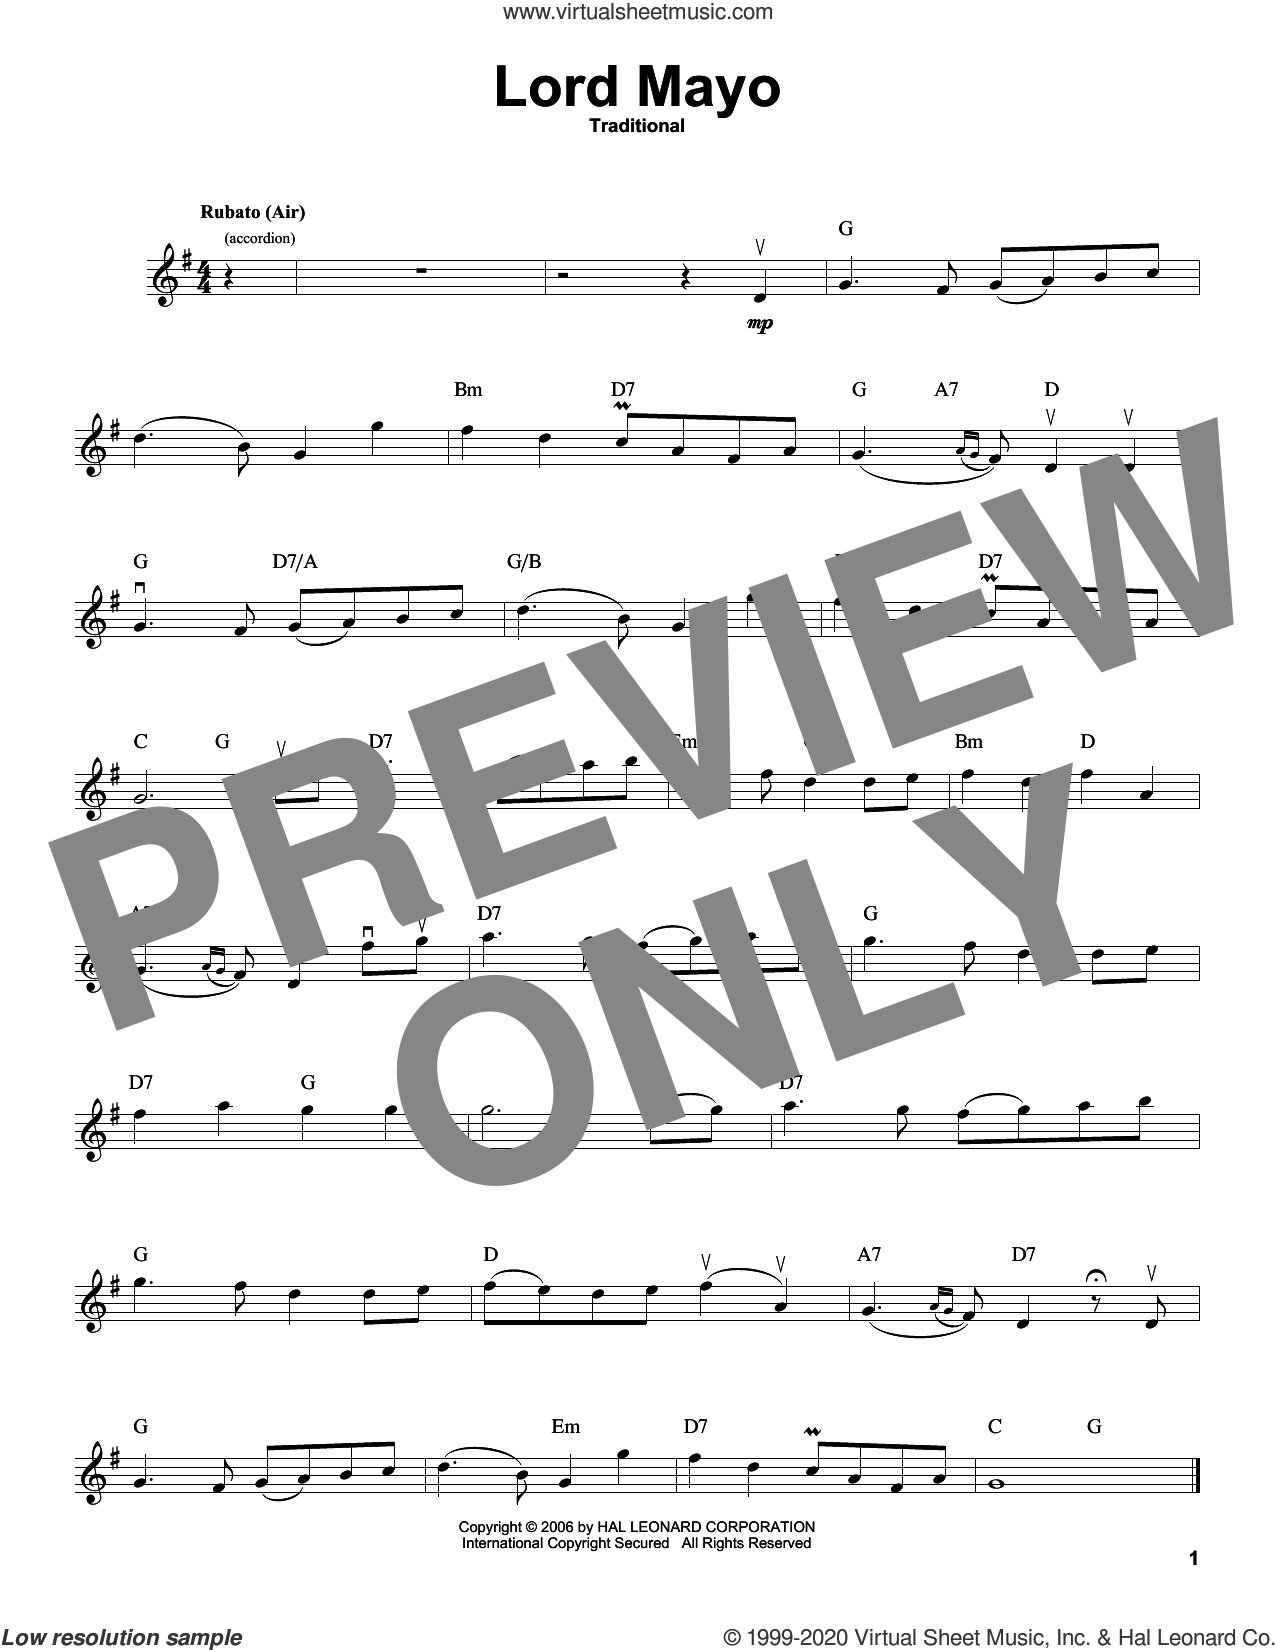 Lord Mayo (Tiarna Mhaigheo) sheet music for violin solo, intermediate skill level